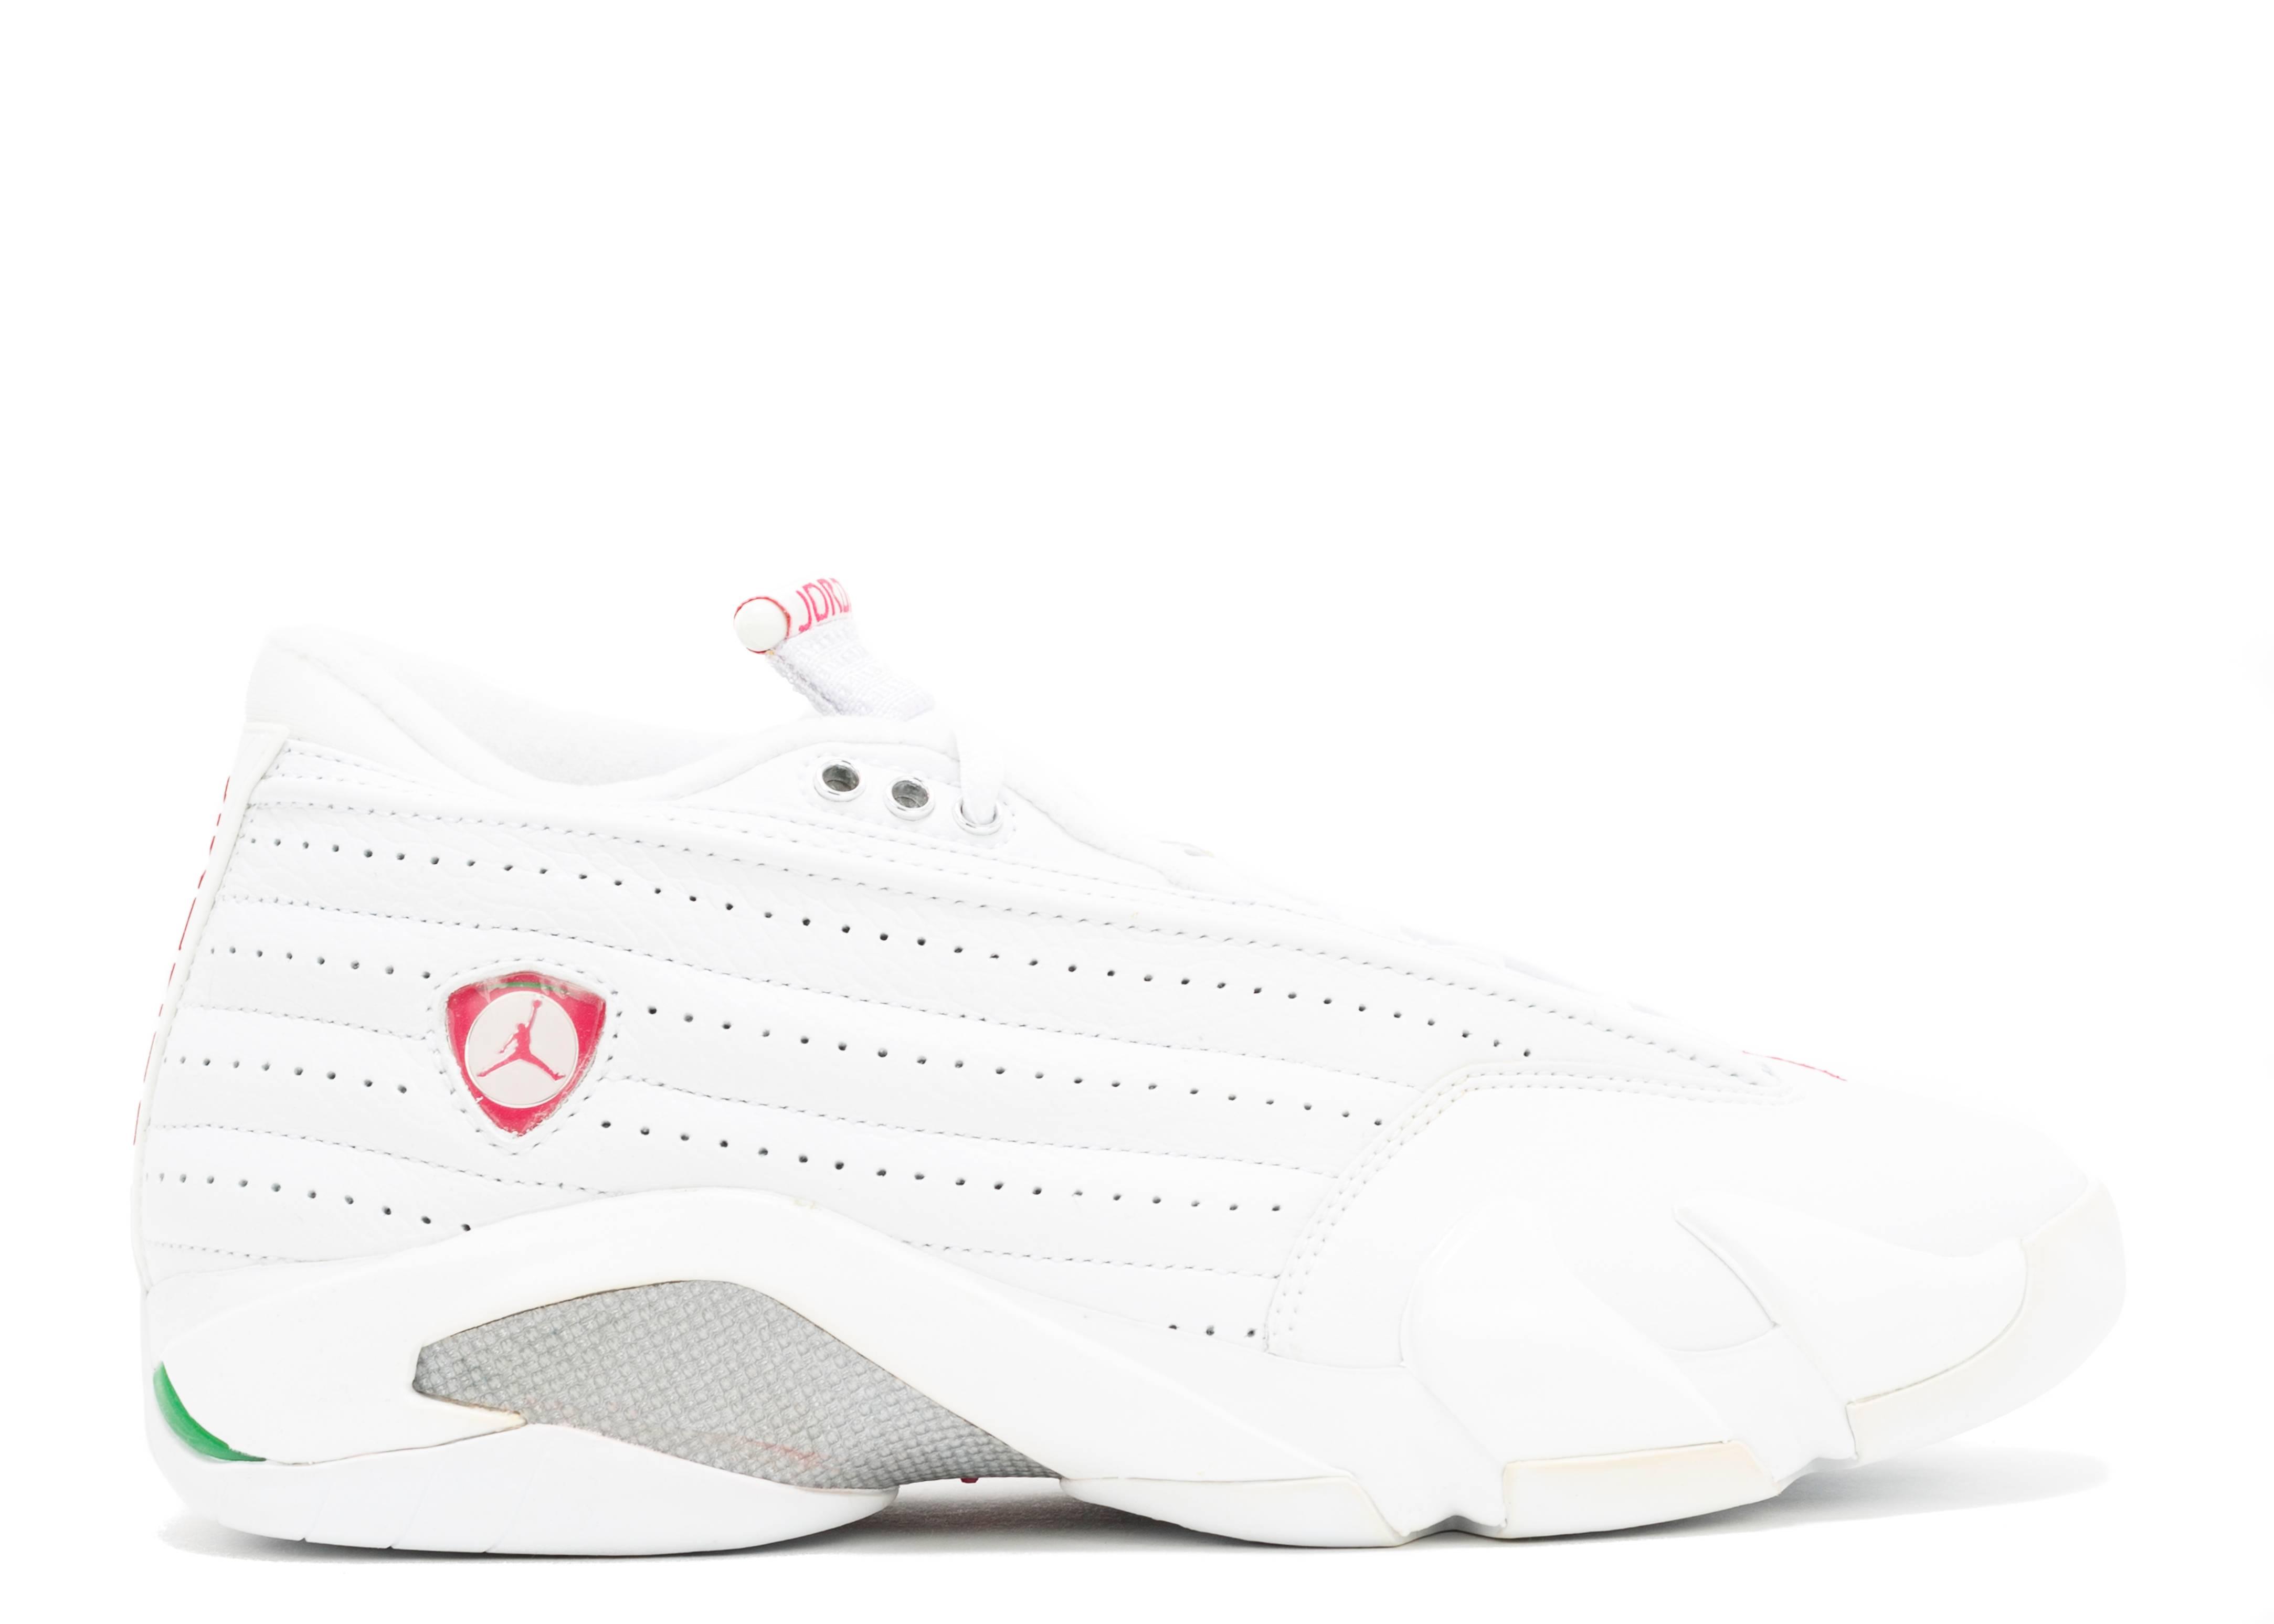 e096bd2af017 Womens Air Jordan 14 Retro Low - Air Jordan - 313044 161 - white ...